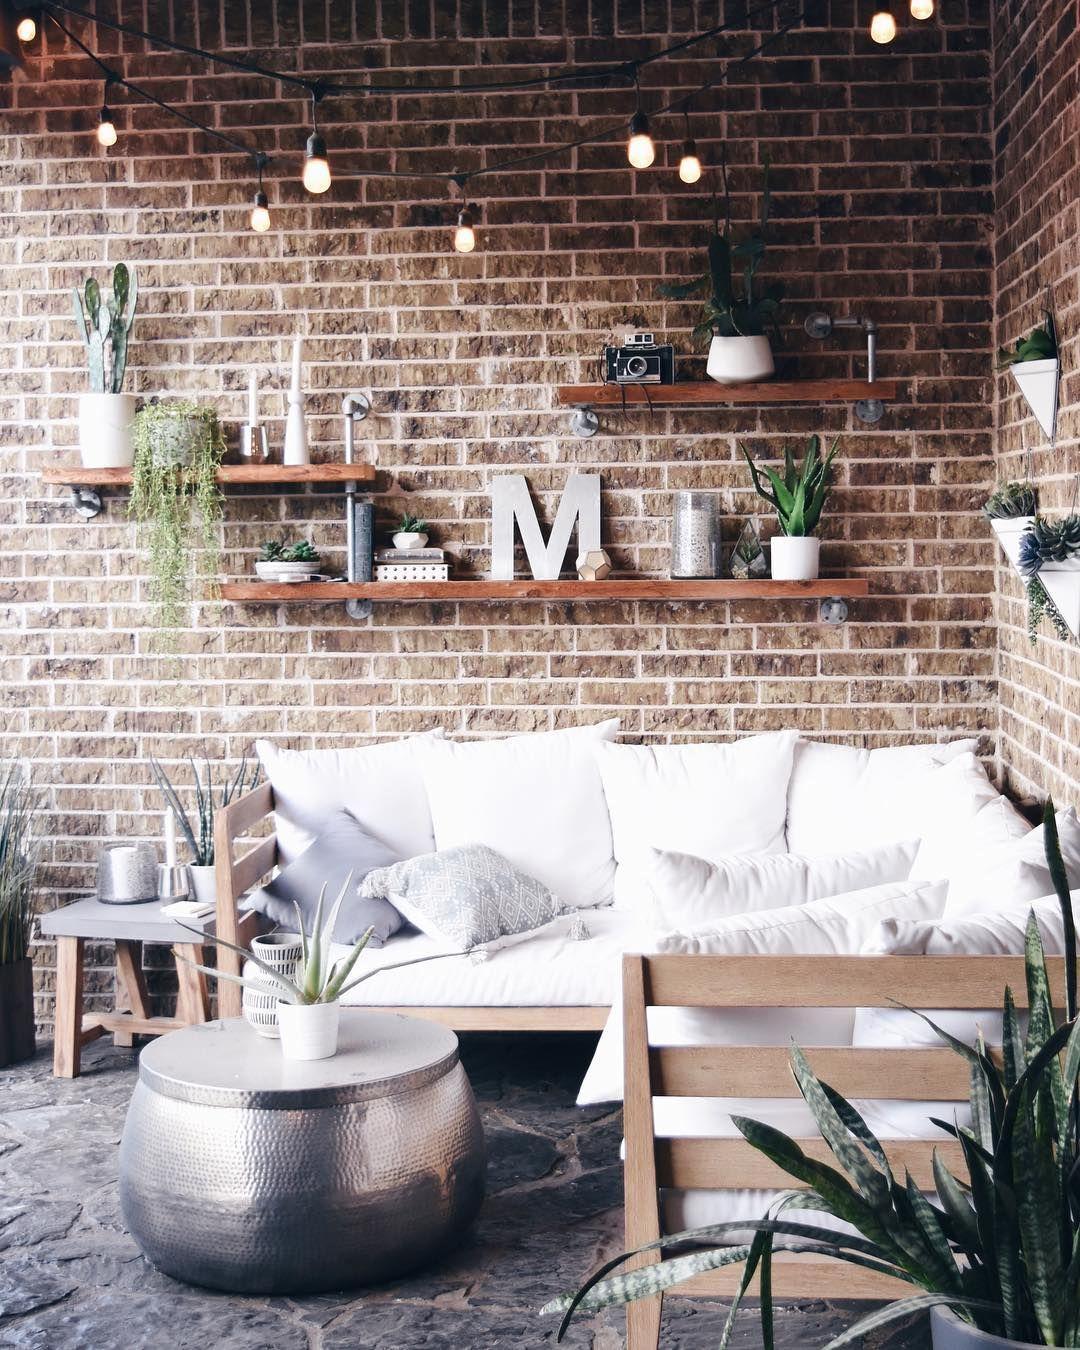 Outdoor Living Space Brick Wall Shelf Brick Living Room Brick Wall Living Room Diy Brick Wall